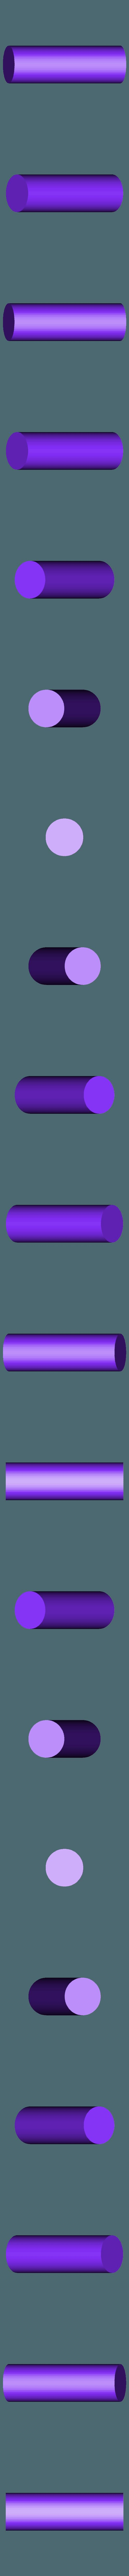 Cylindre.stl Download free STL file Simplest top spool holder for anycubic kossel+ • 3D printable design, aleph34